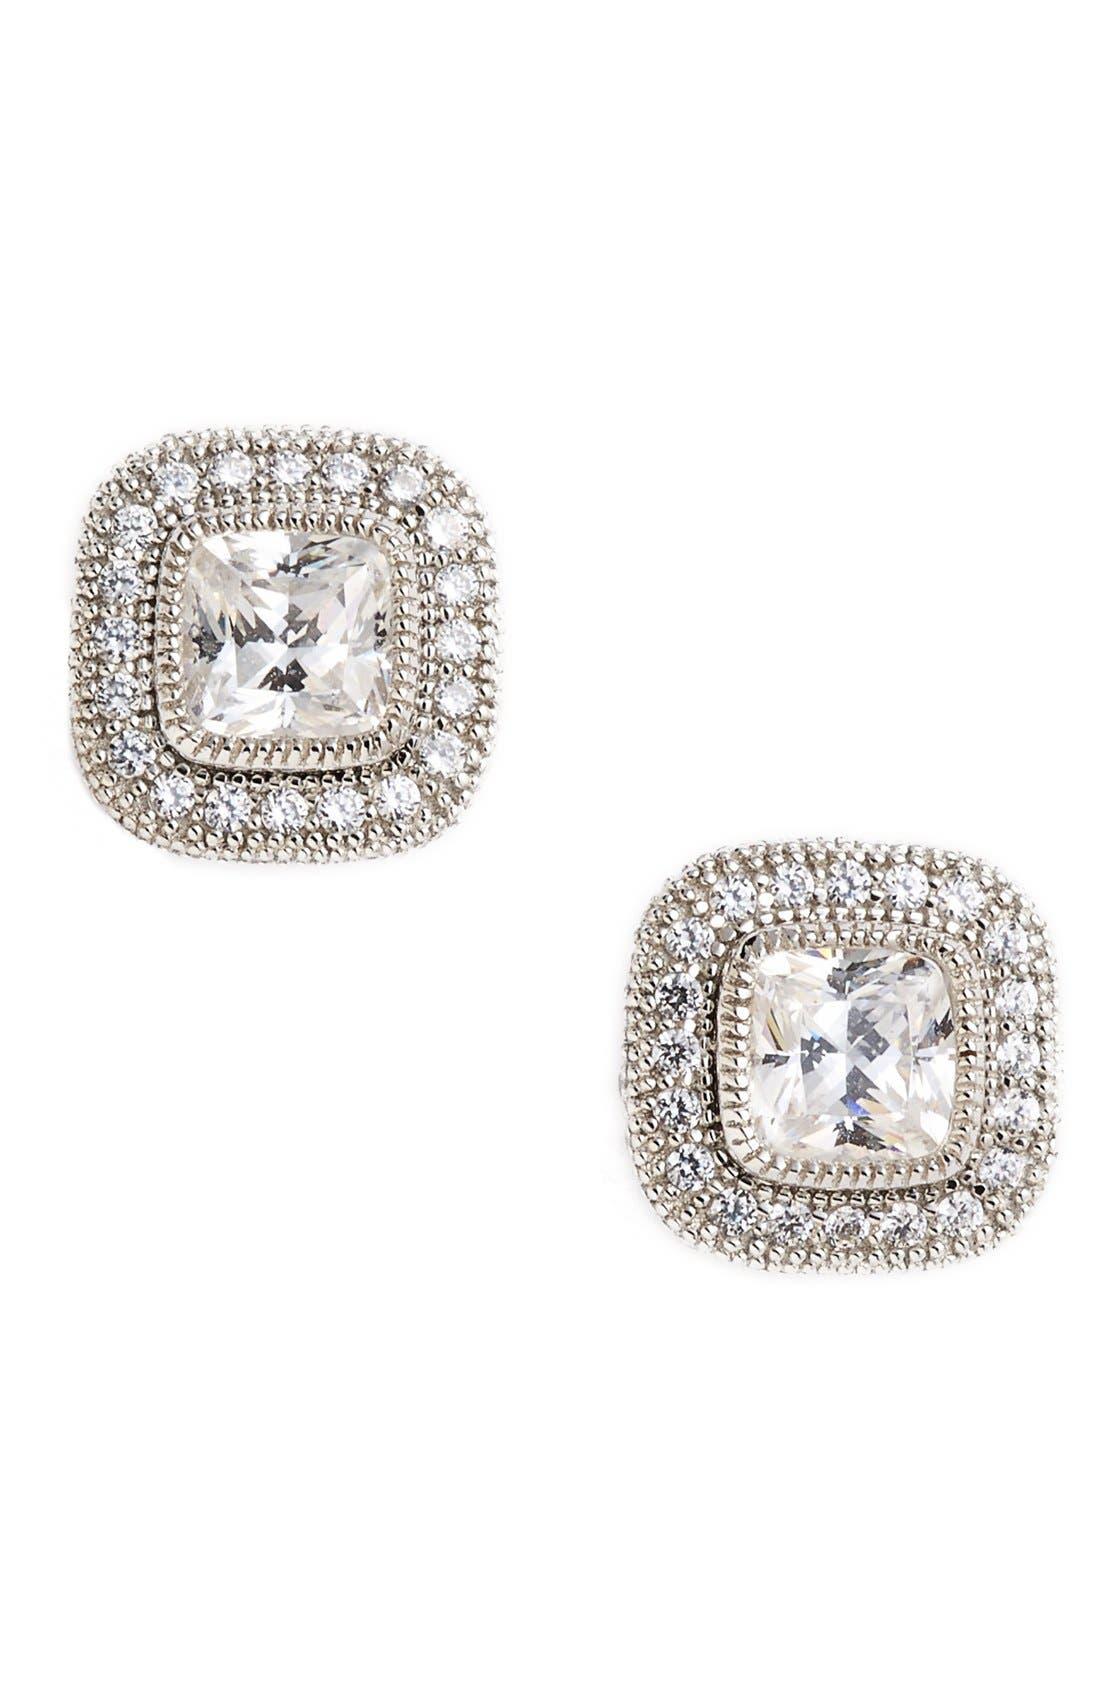 'Lassaire' Square Stud Earrings,                         Main,                         color, Silver/ Clear